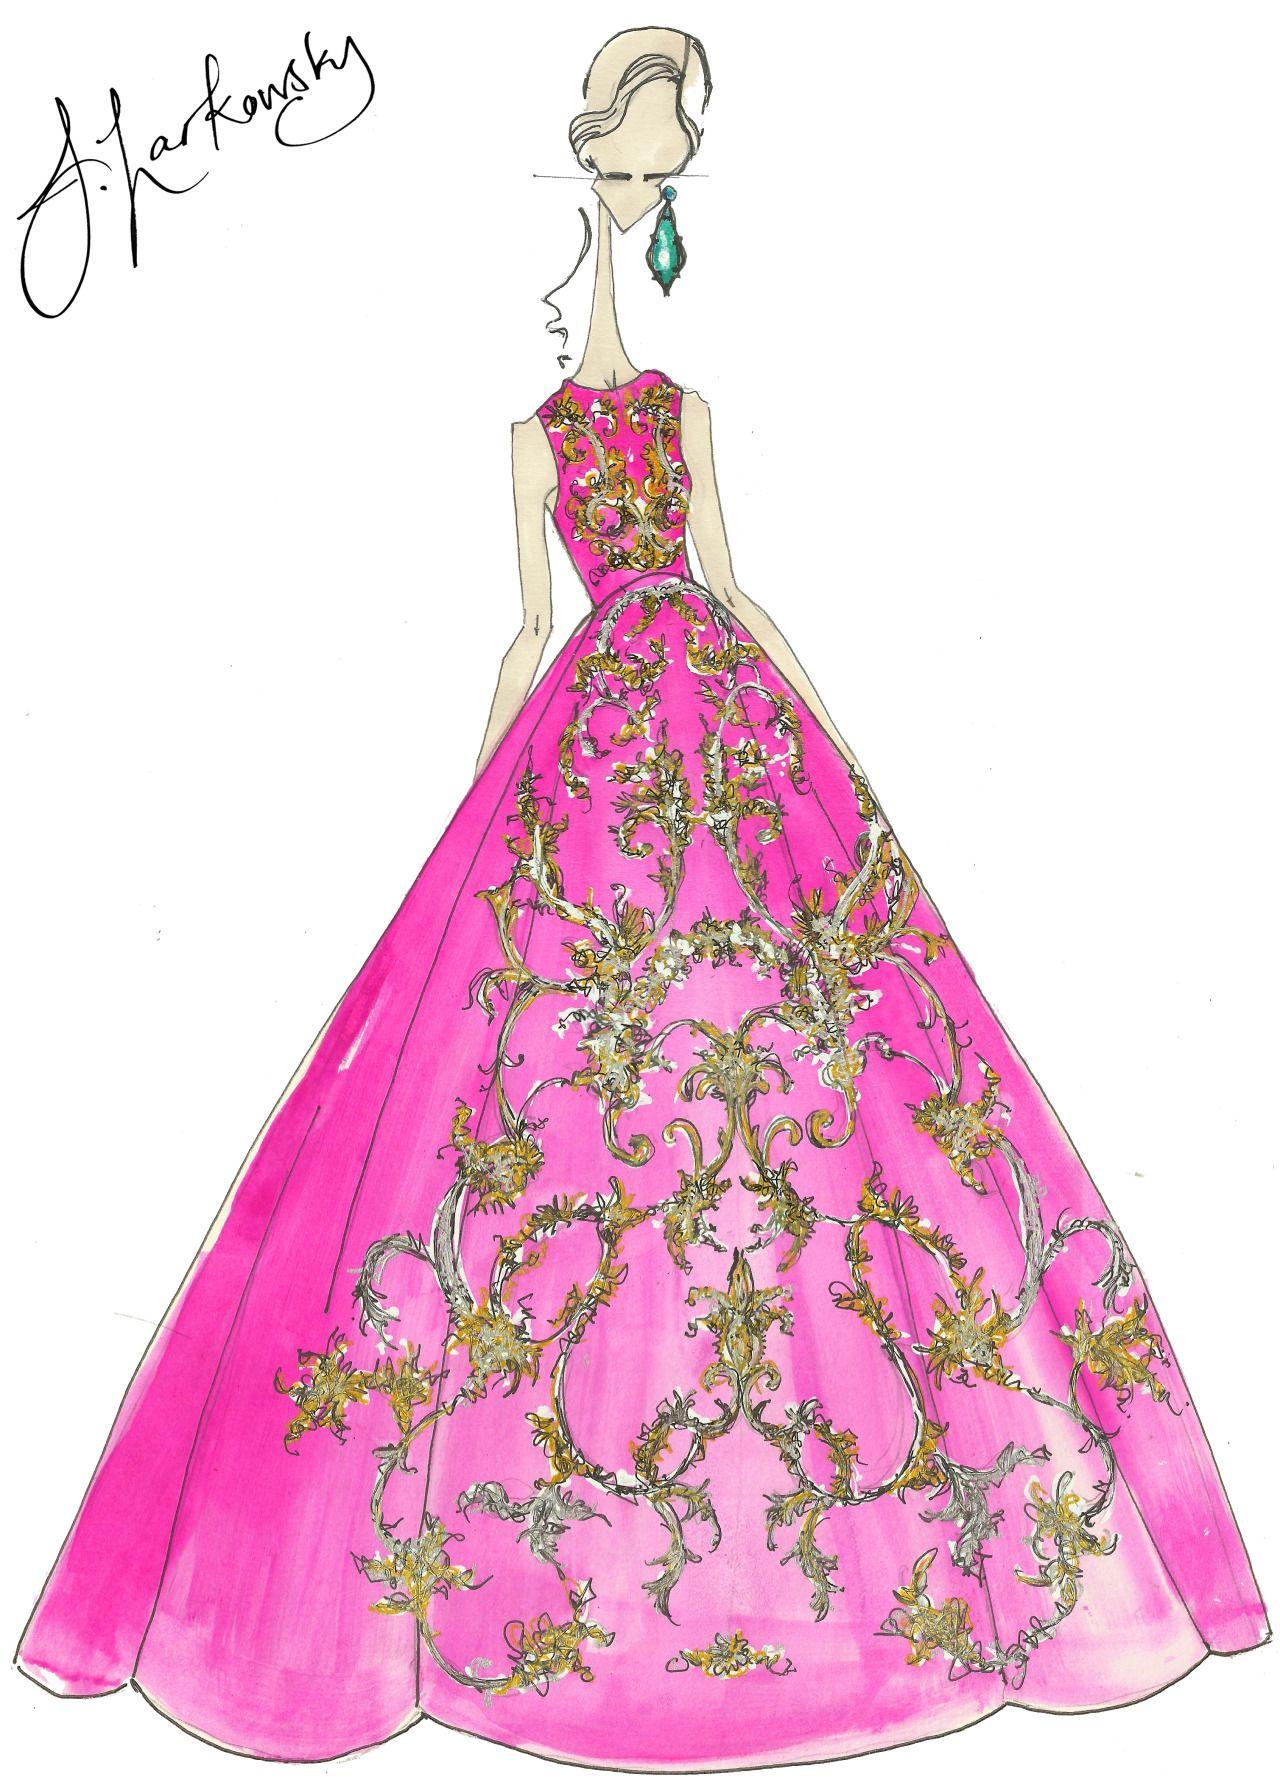 Oscar De La Renta dress fashion re illustration by joseph larkowsky ...